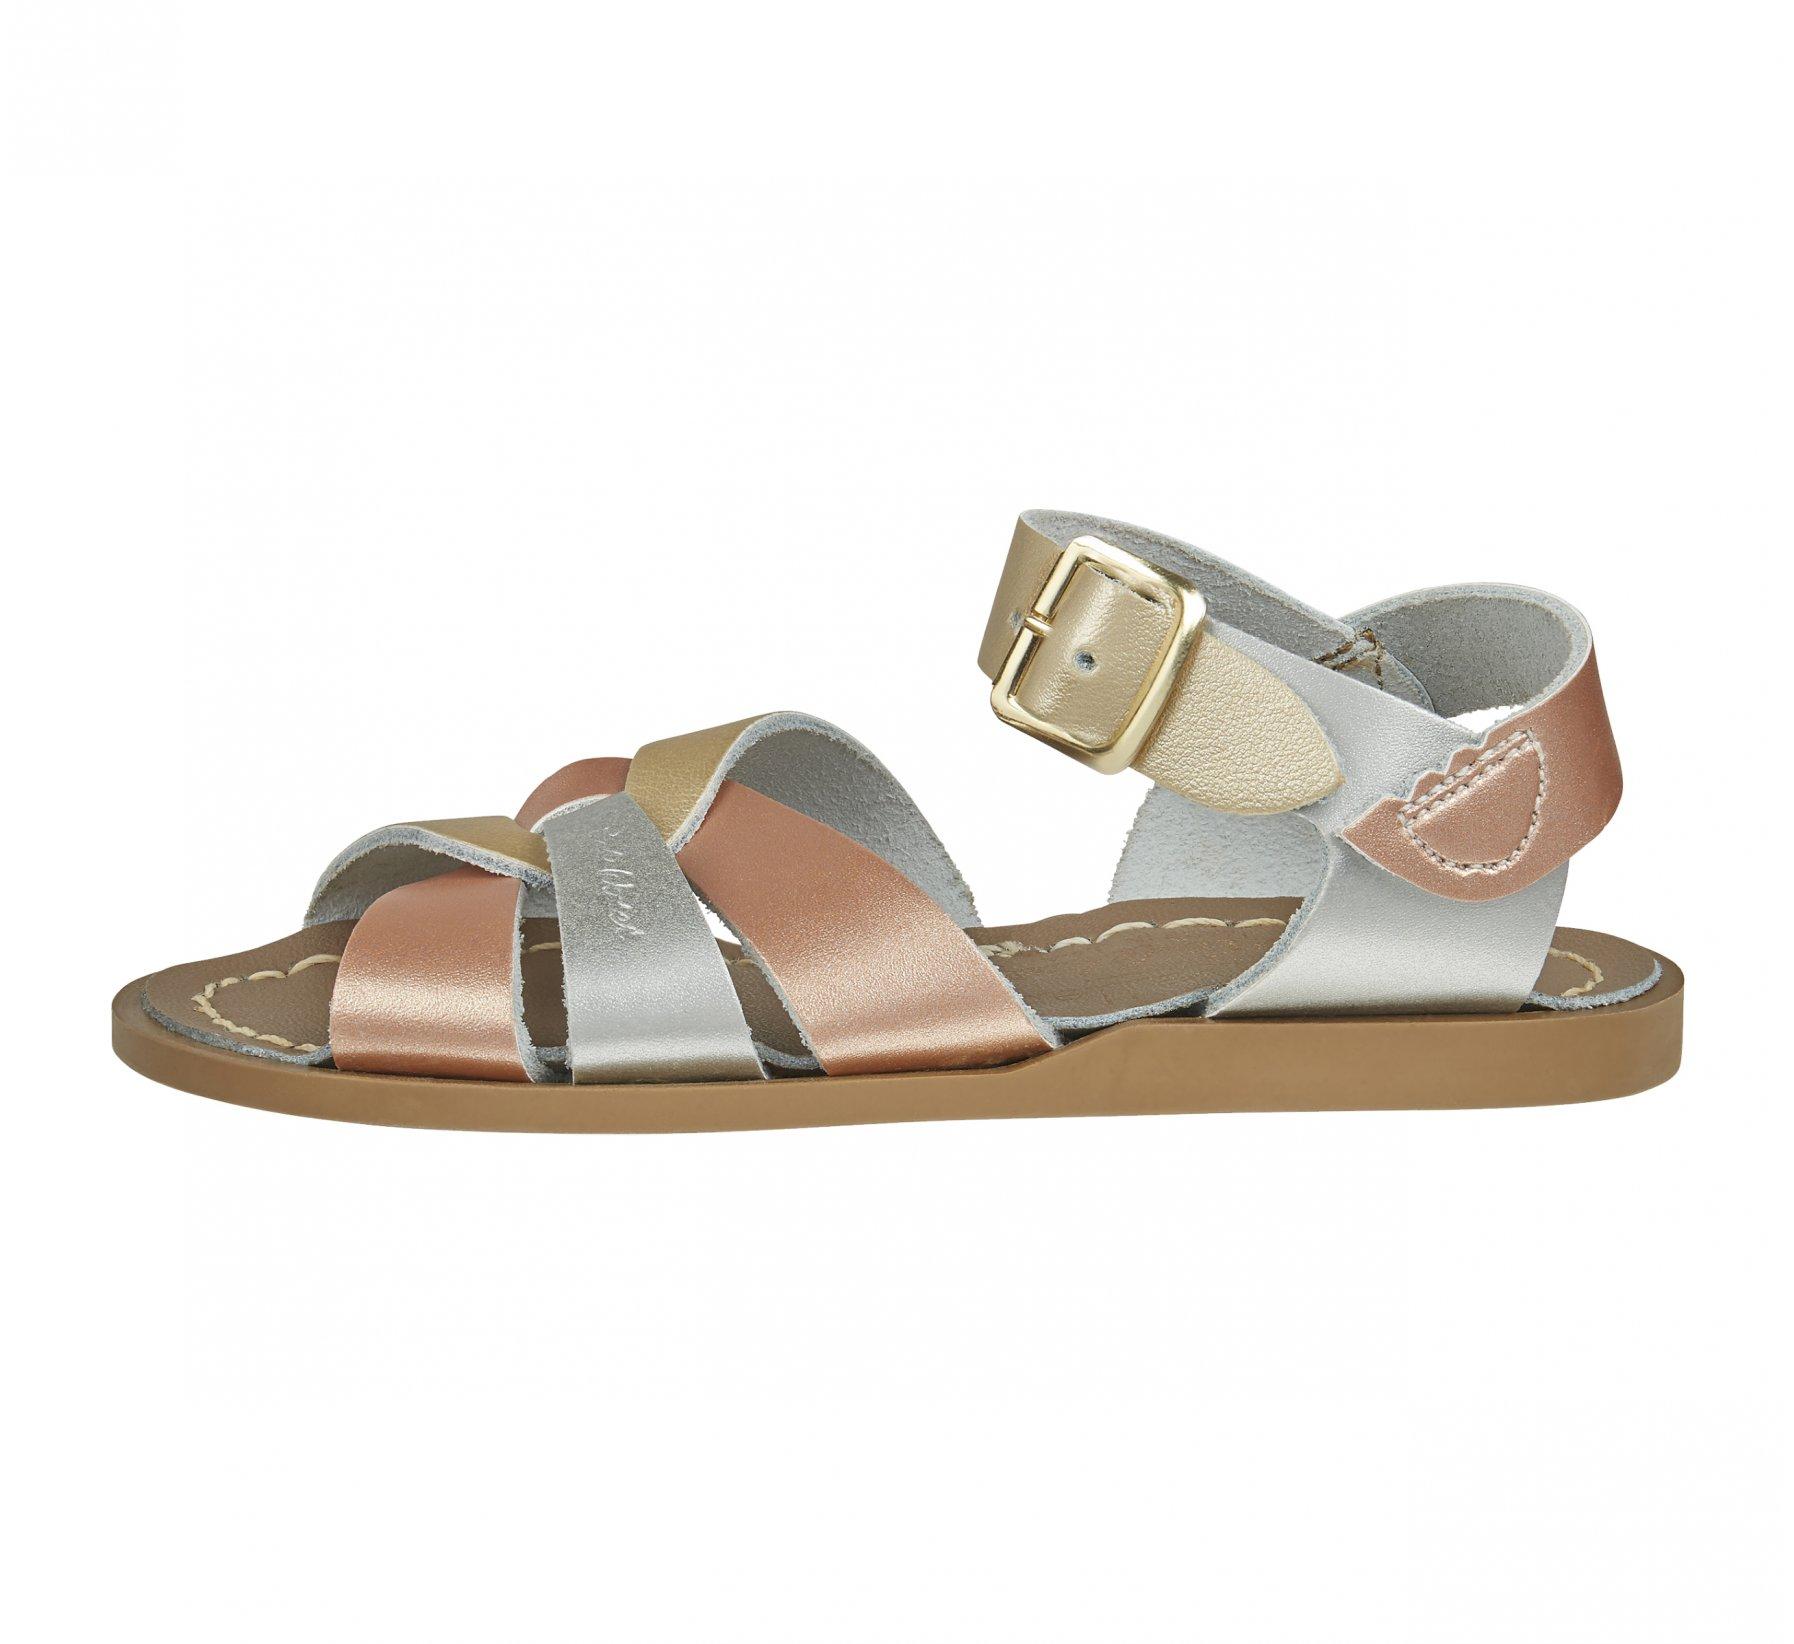 Venchanie Russe - Salt Water Sandals